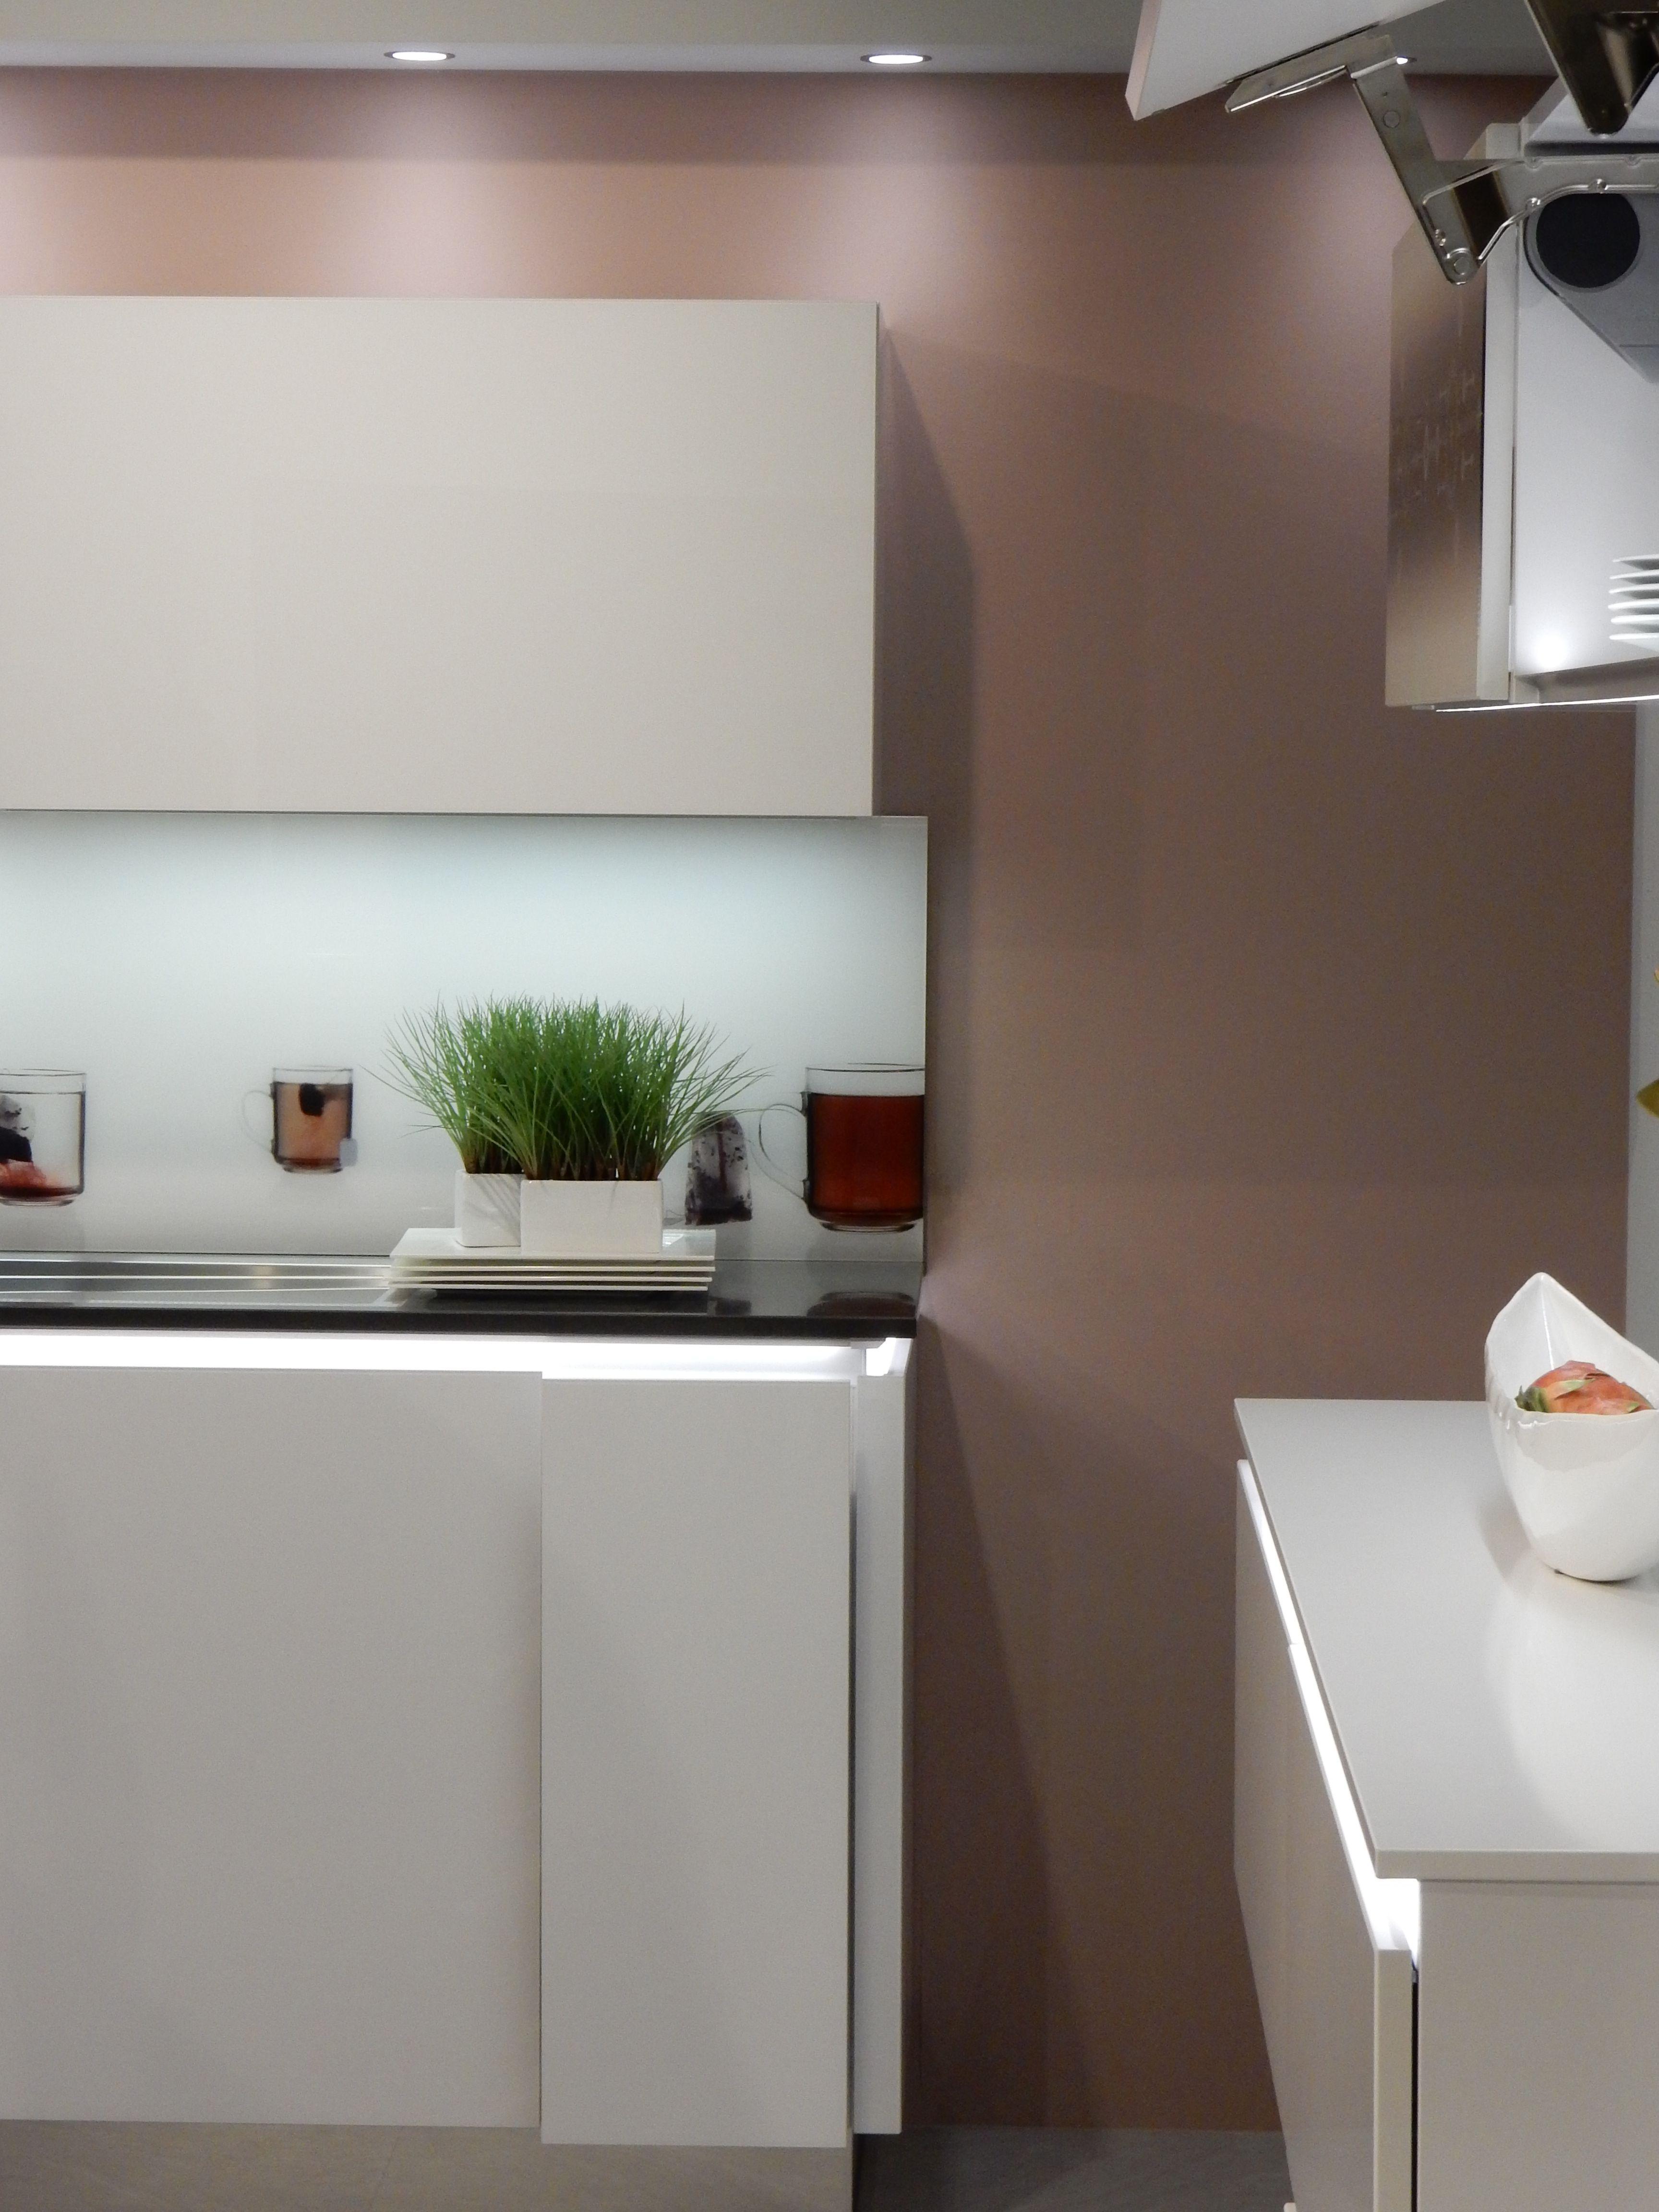 131 best images about Neutrale kleur keuken achterwand